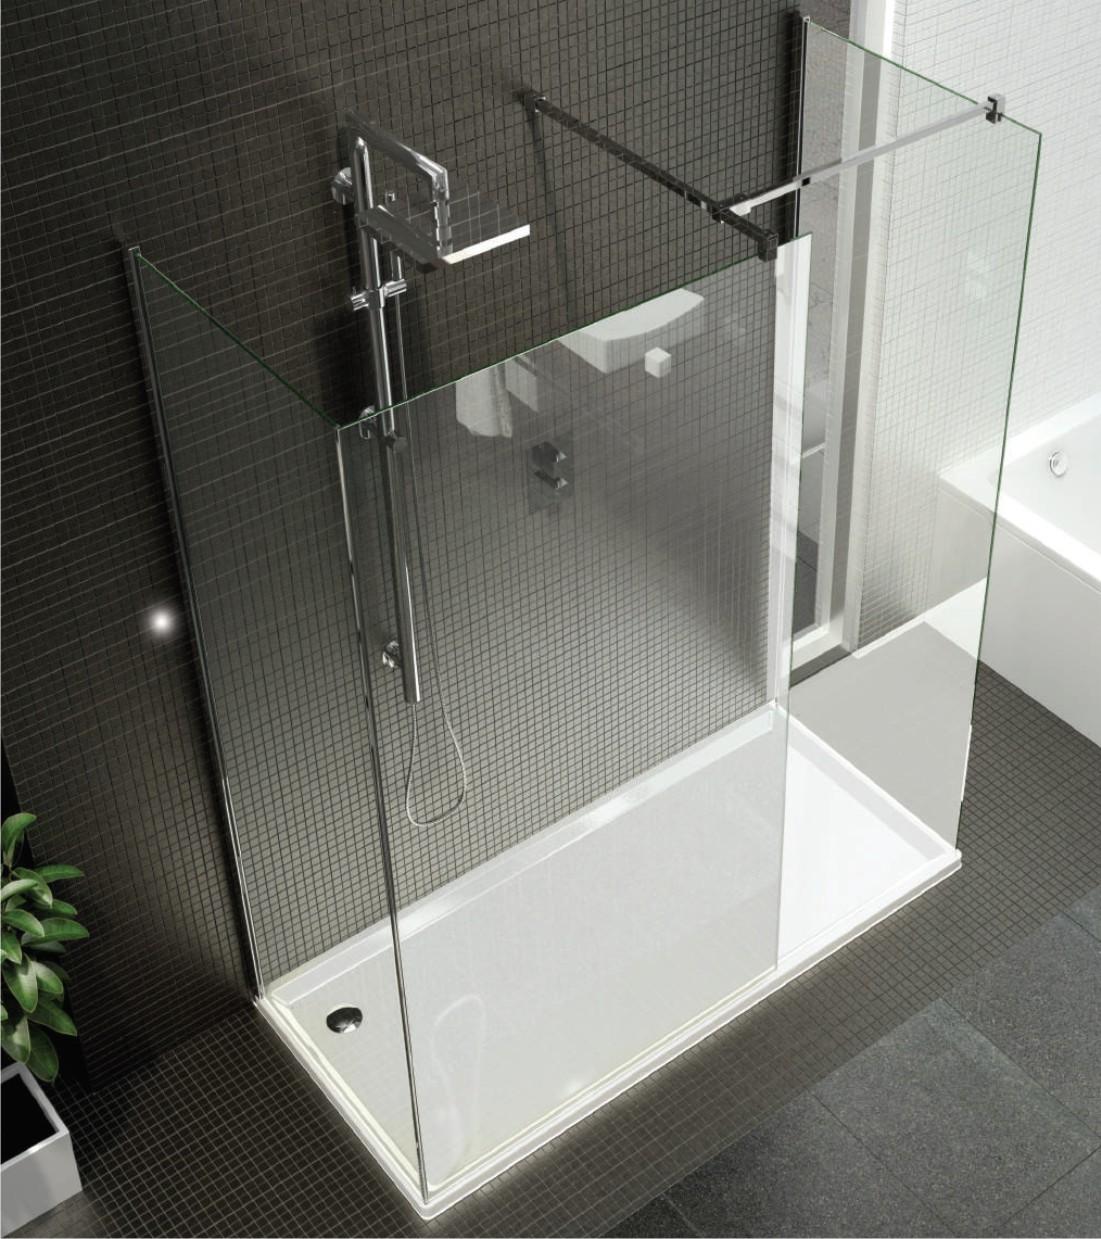 Vision Three Sided Enclosure Frameless Shower Showerline